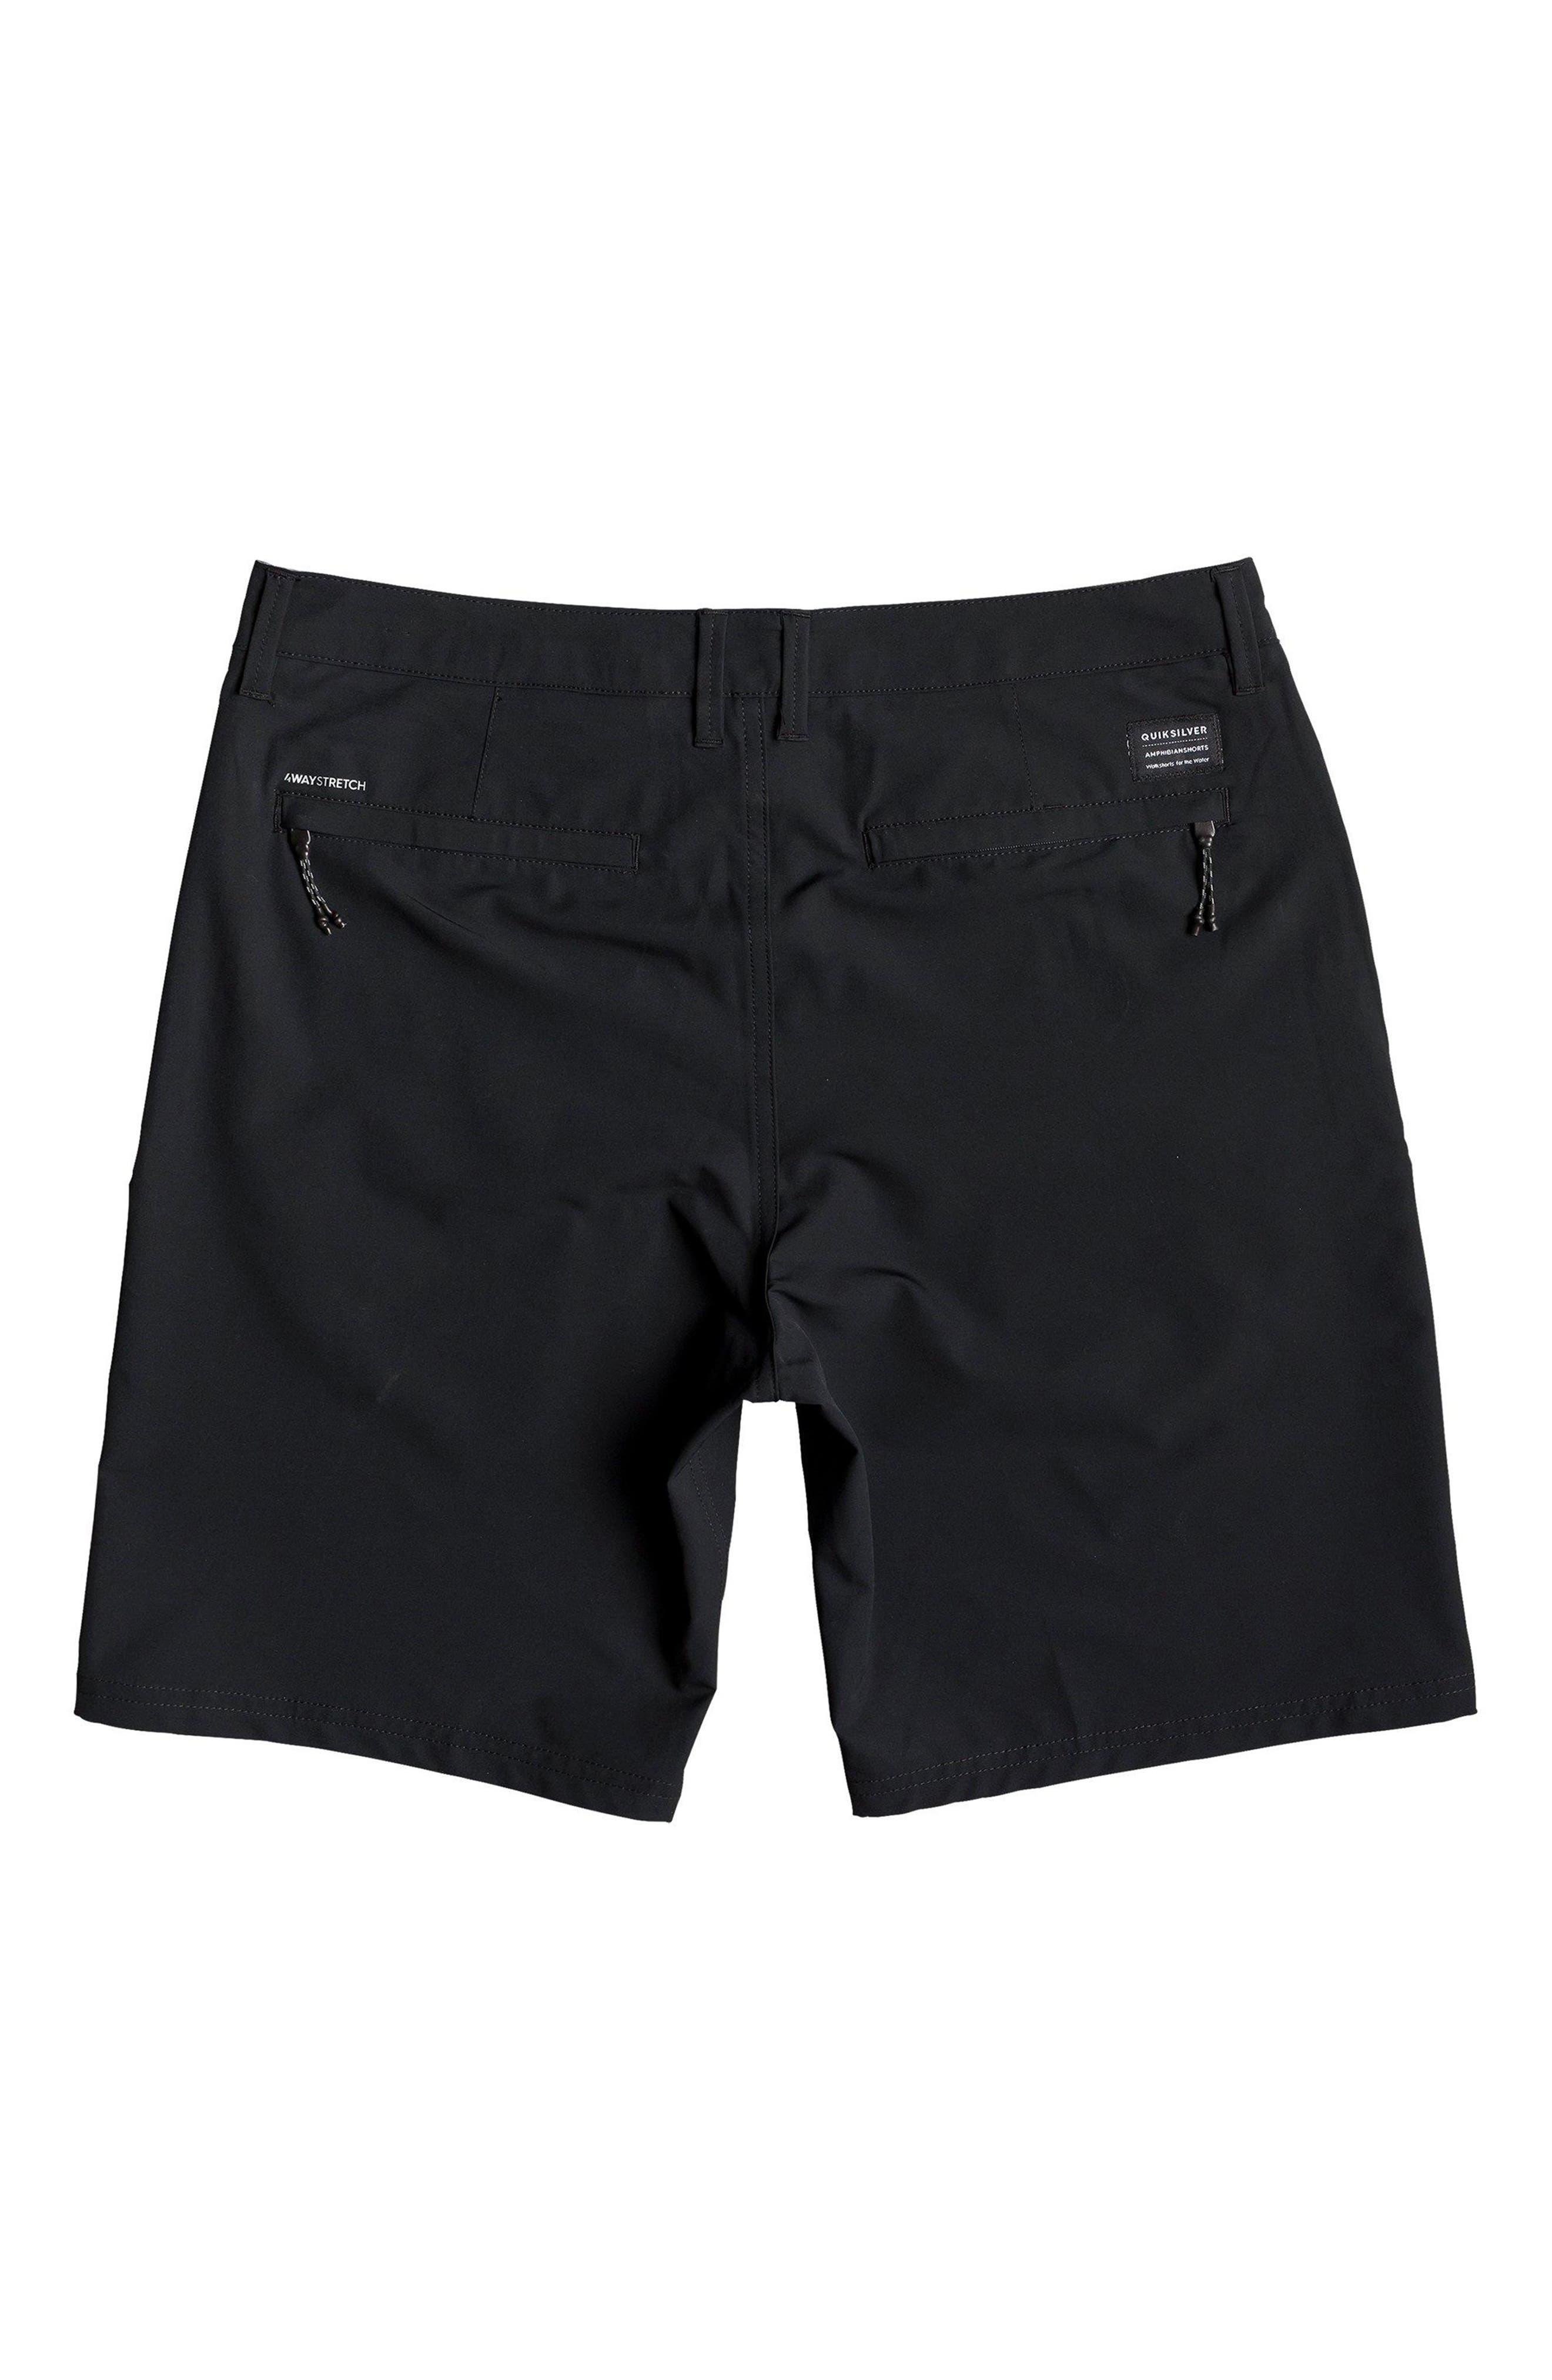 QUIKSILVER, Navigate Amphibian Shorts, Alternate thumbnail 4, color, BLACK